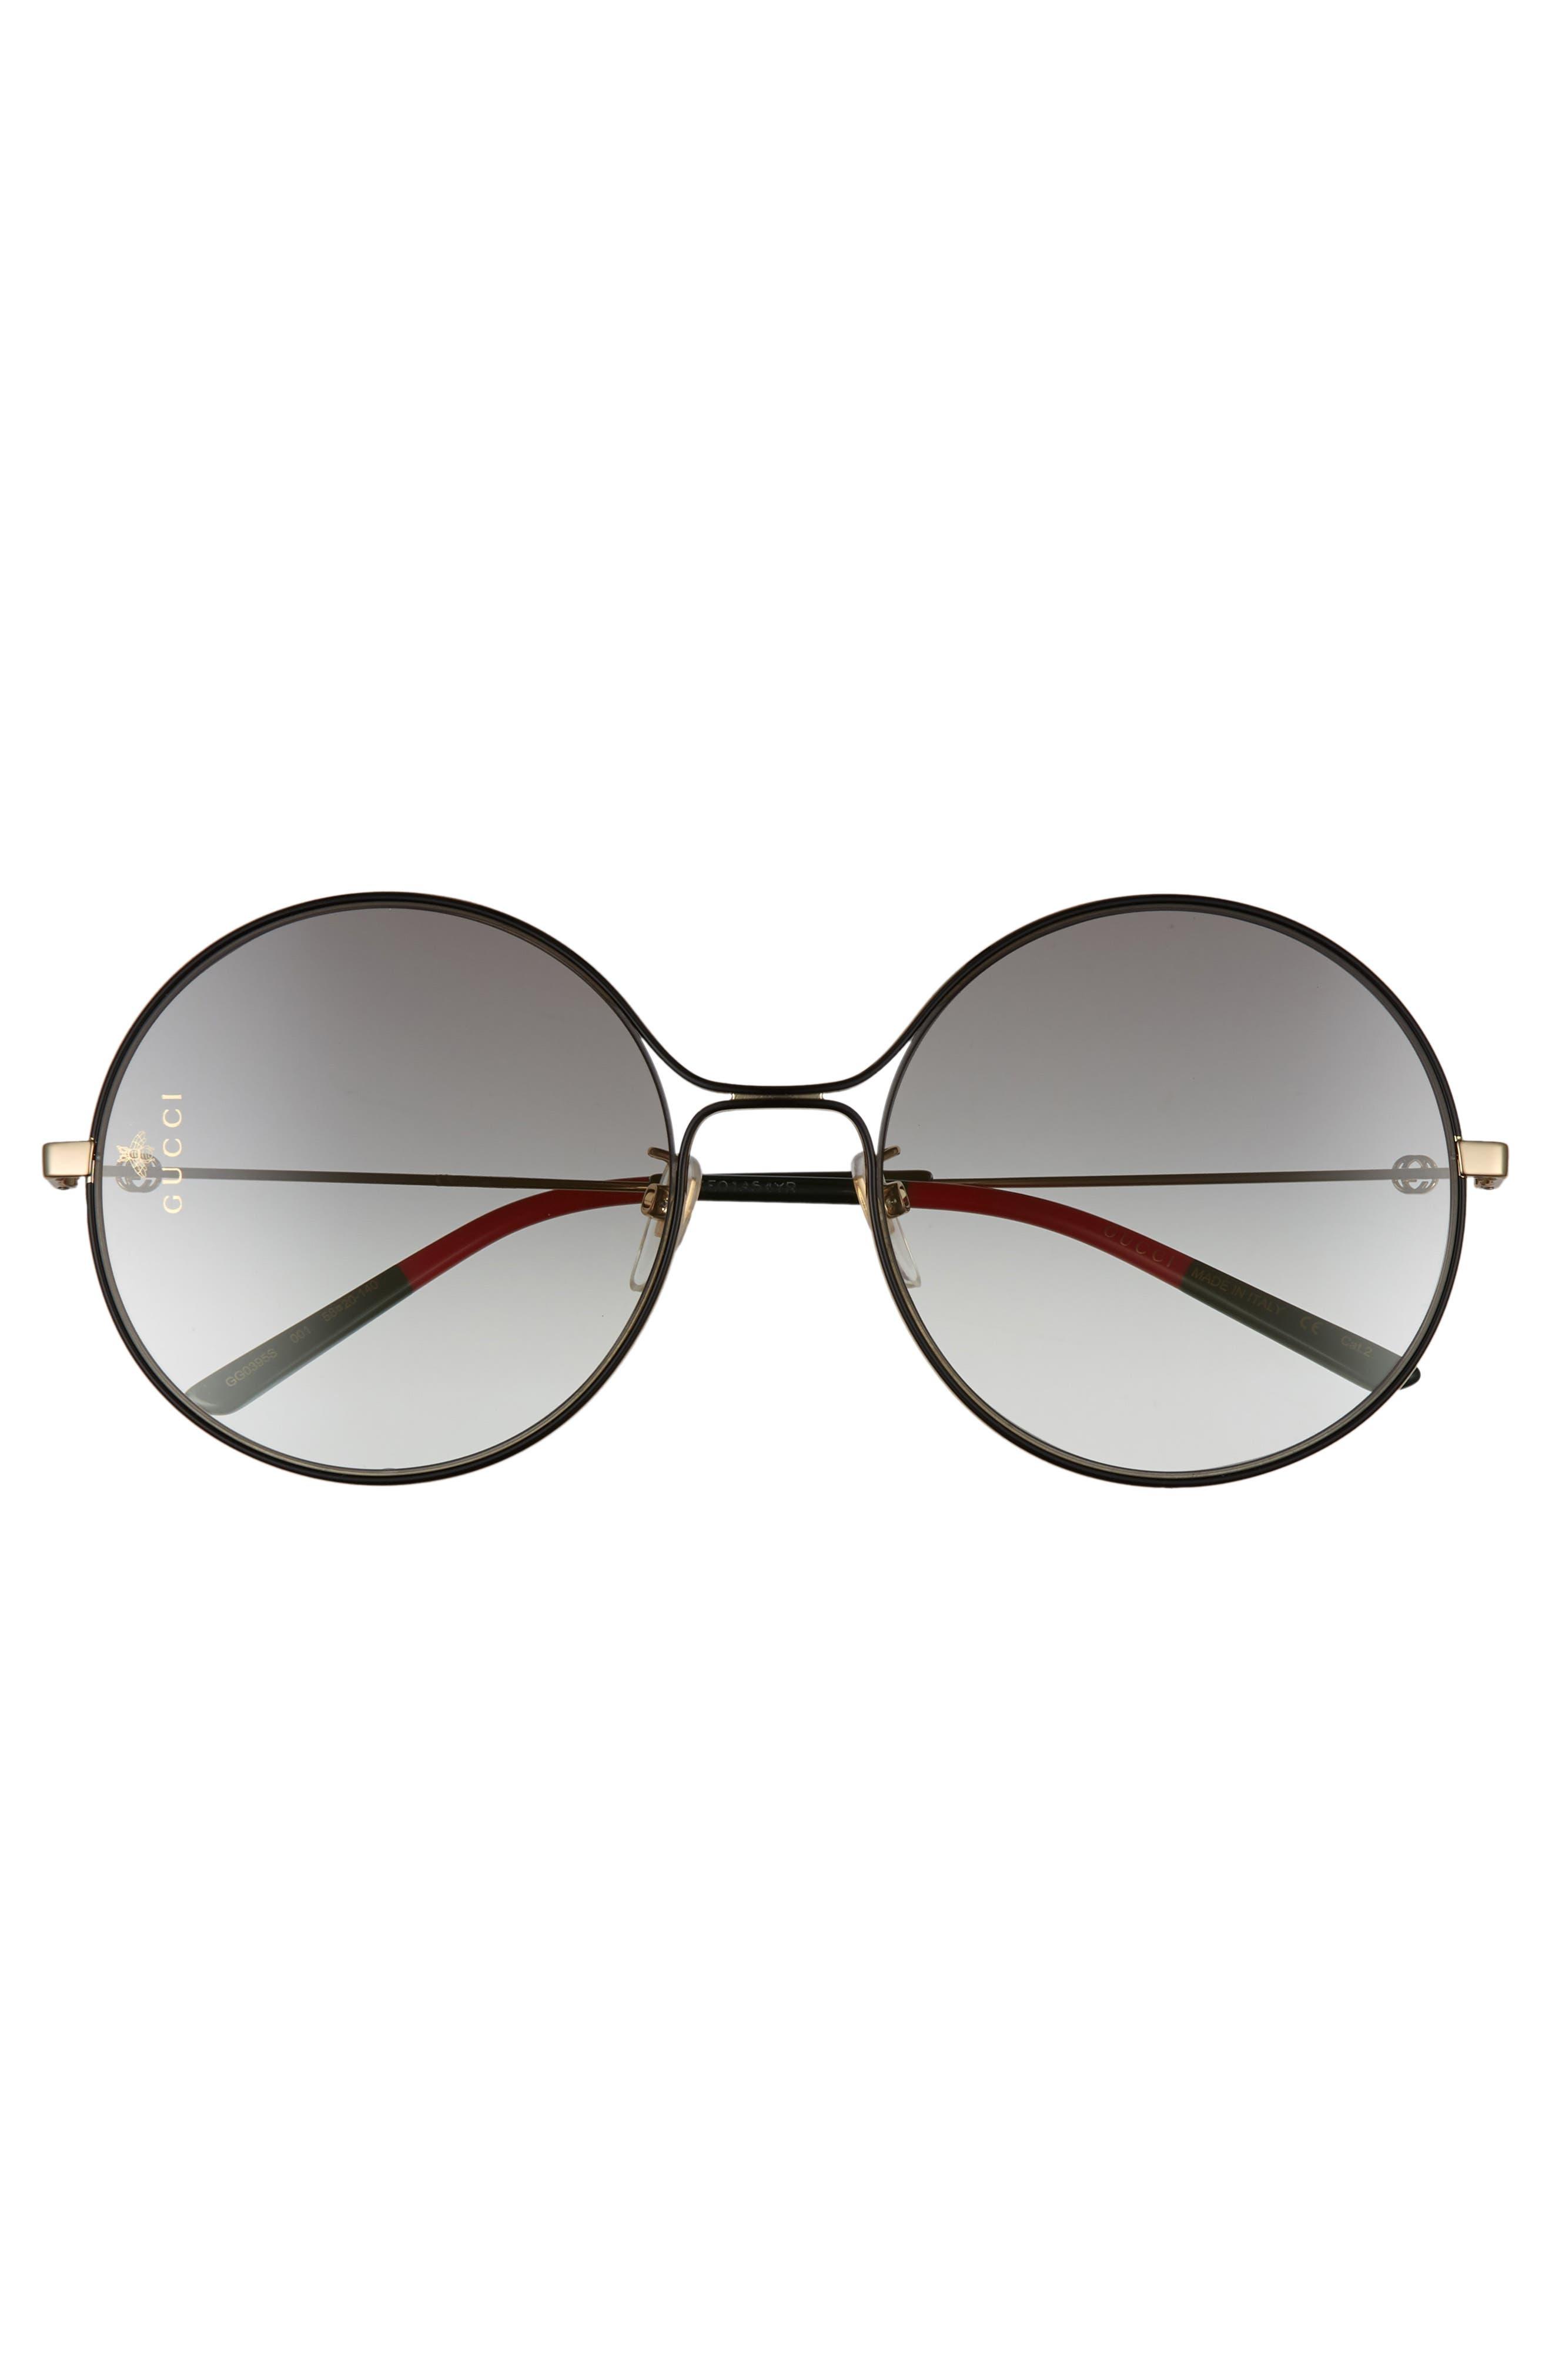 58mm Round Sunglasses,                             Alternate thumbnail 3, color,                             GOLD/ BLACK/ GREY GRADIENT